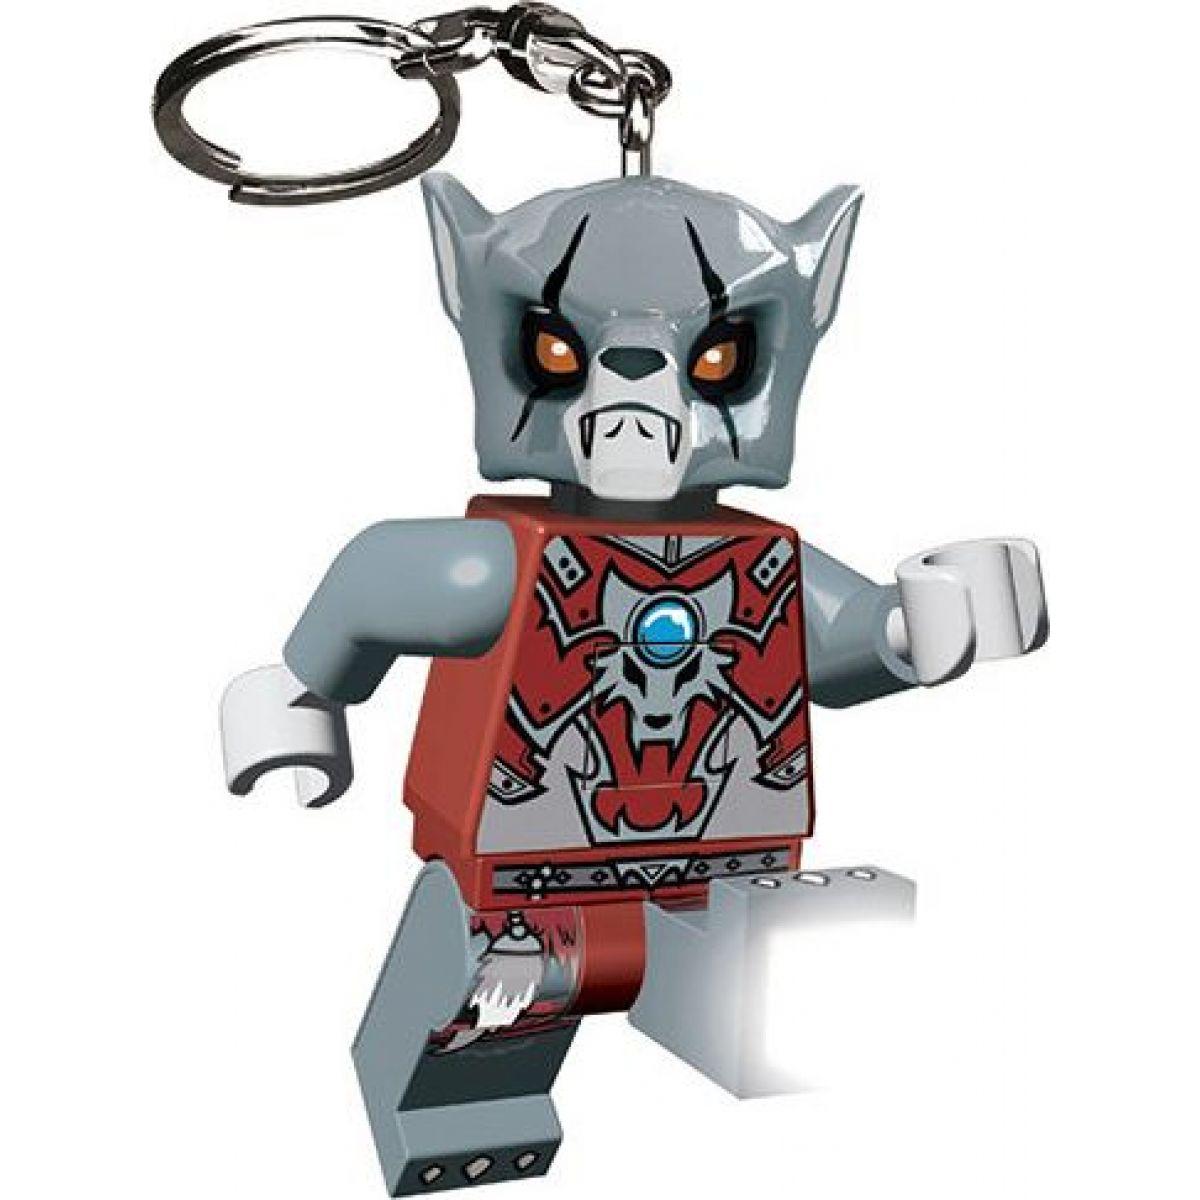 Prívesok na kľúče LEDLite LEGO Chima Worriz Svítící